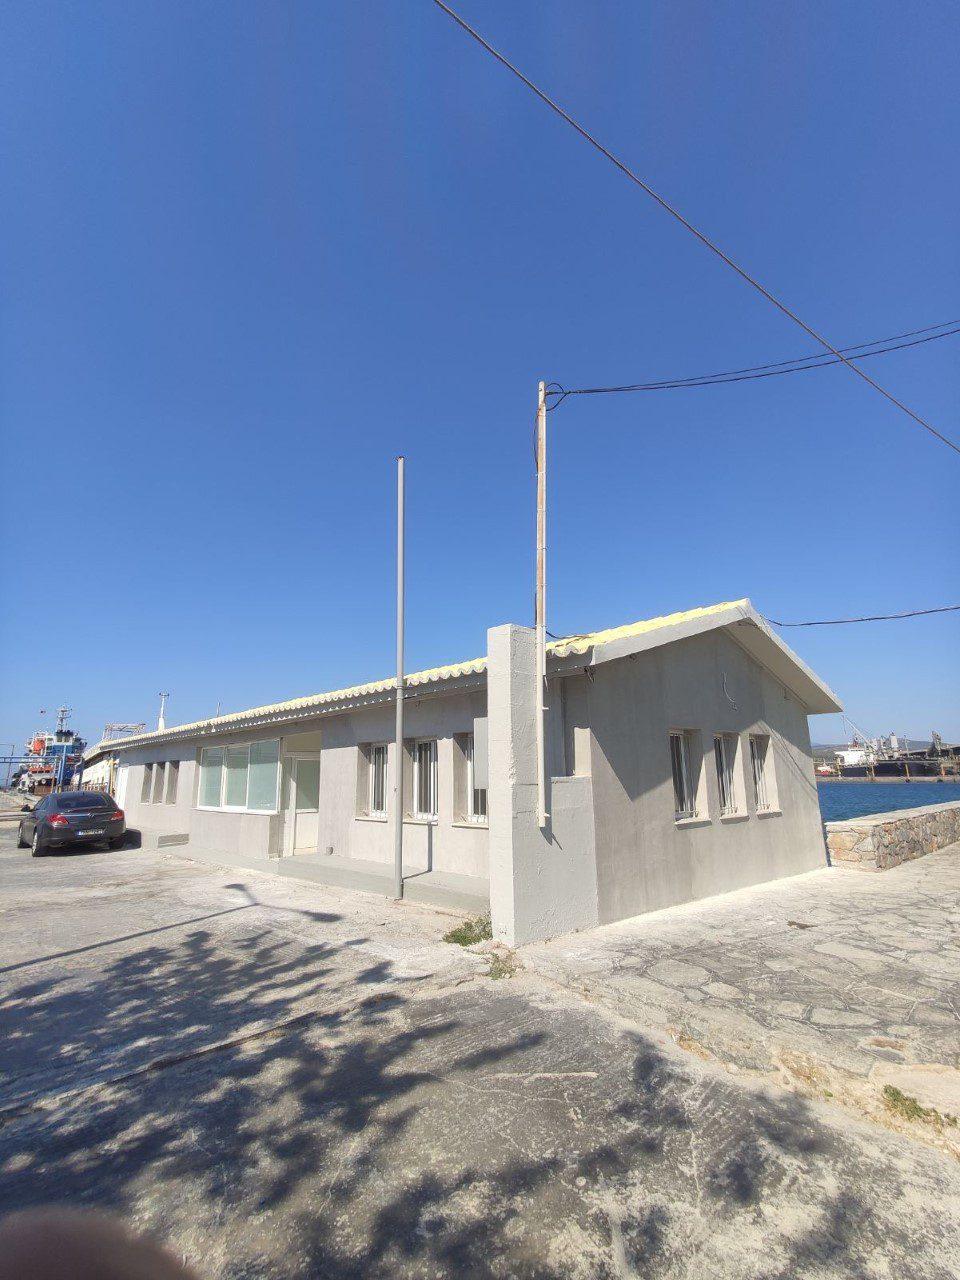 You are currently viewing Ολοκληρώθηκαν οι τεχνικές εργασίες για την αποκατάσταση δύο κτηρίων Ο.Λ.Ε. ΑΕ στην παραλία Ελευσίνας